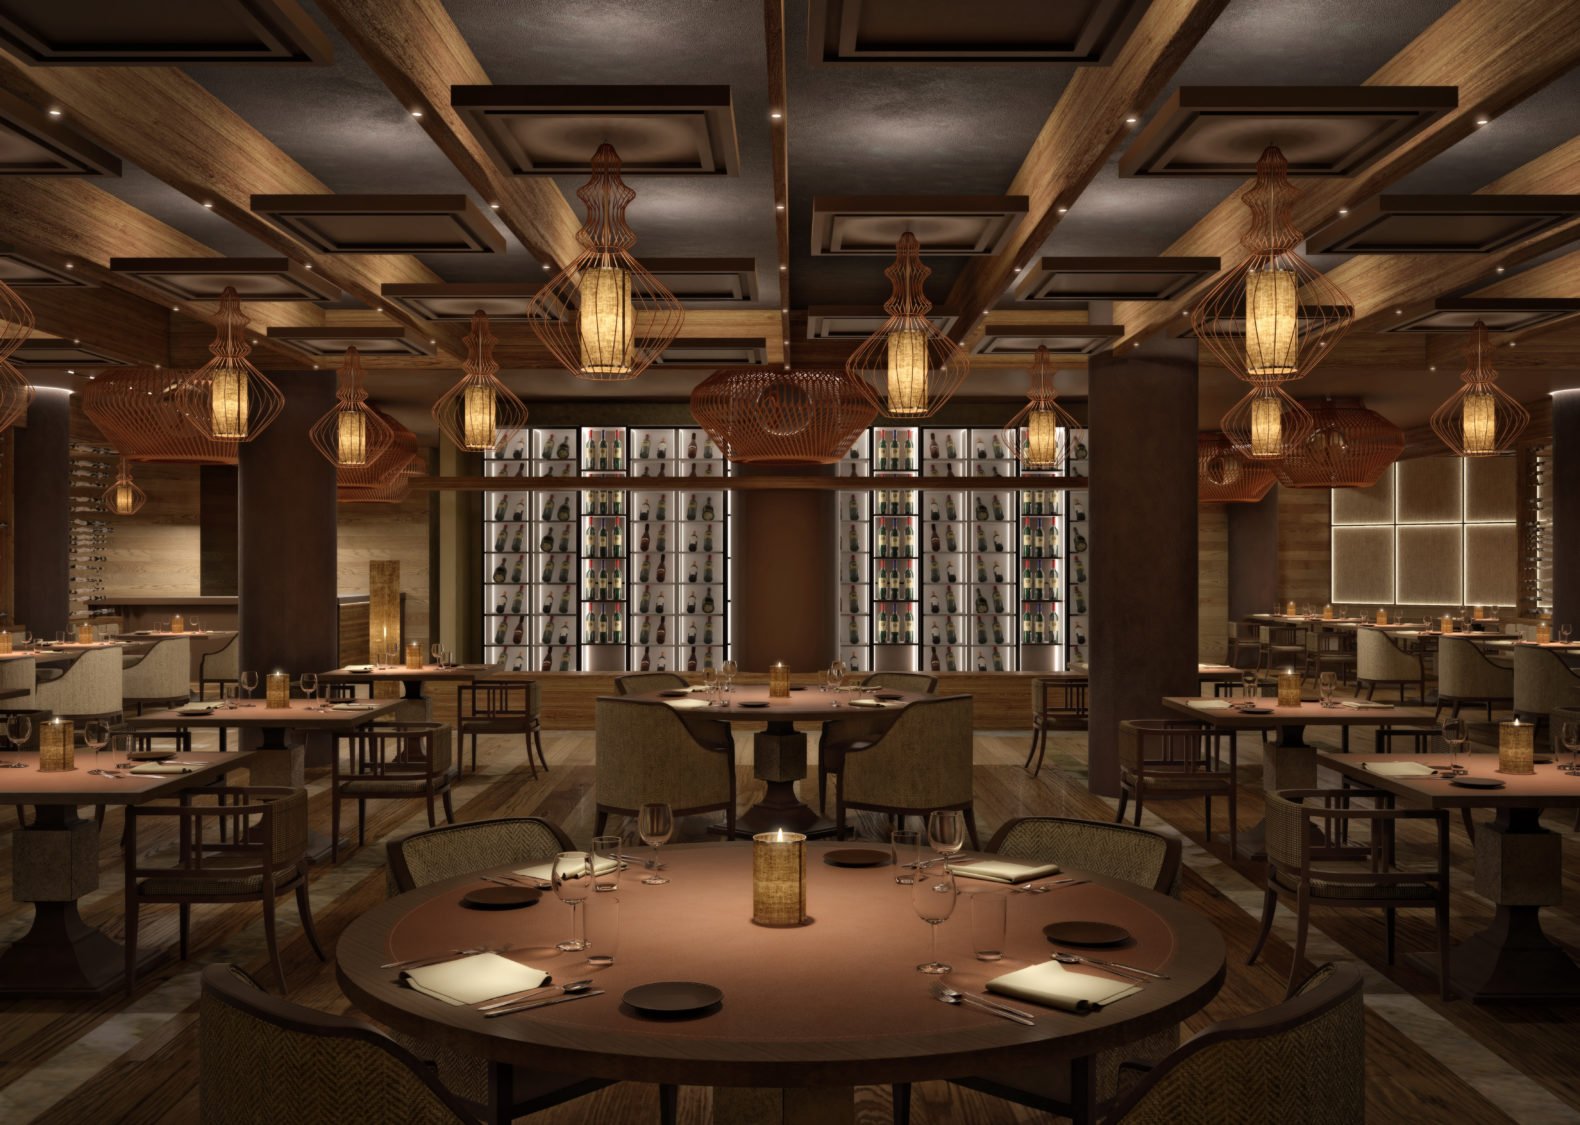 main-restaurant-healthy-cuisine-cozy-atmosphere-lefay-resorts-dolomiti-italy